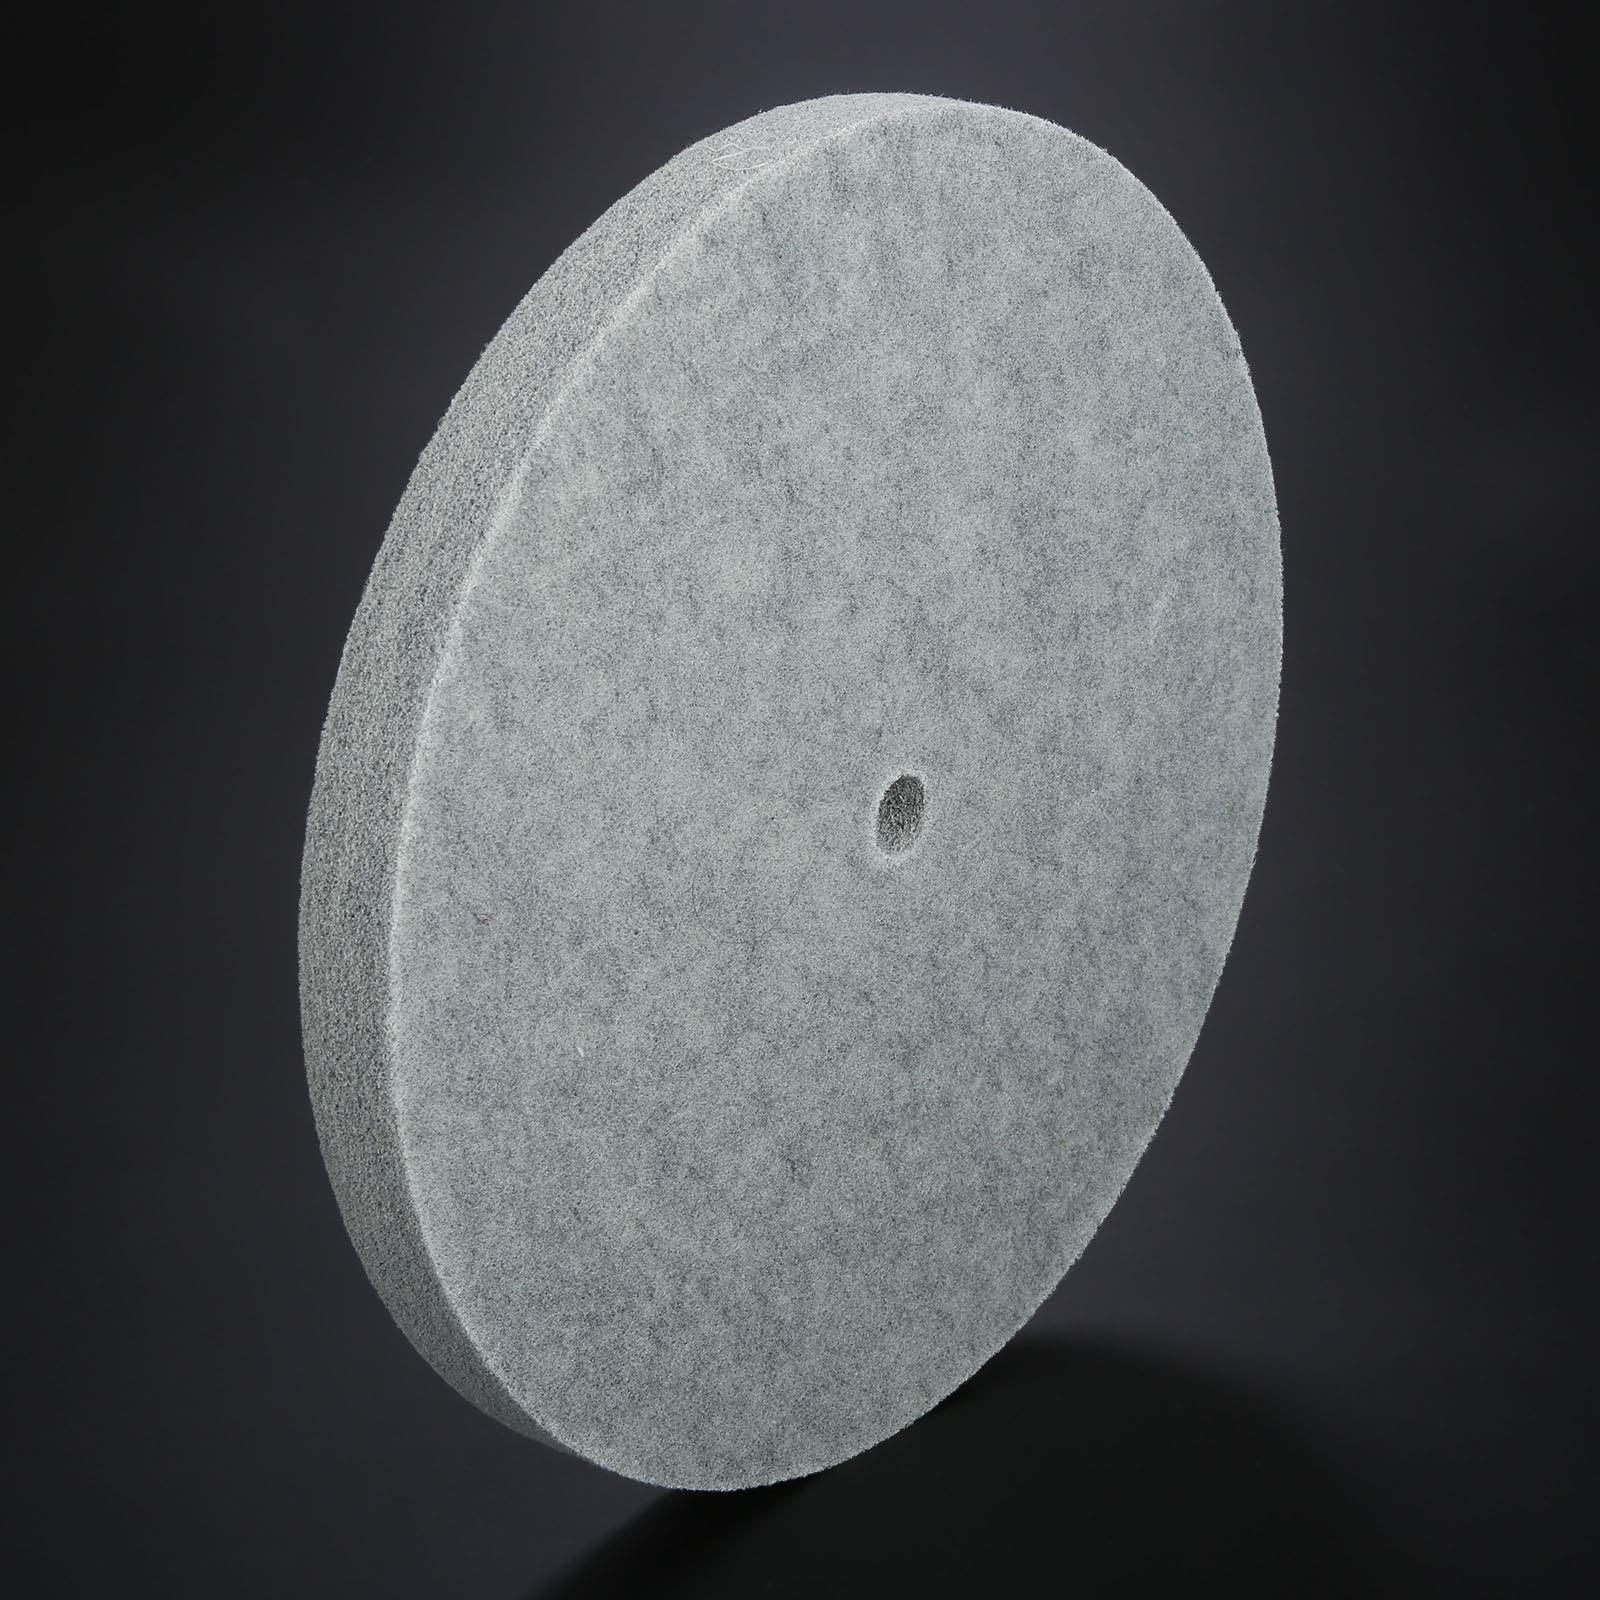 1 PC Thickness Nylon Fiber Polishing Wheel Non-Woven Unitized Wheel 5P 180#, 300MM by Yetaha (Image #6)